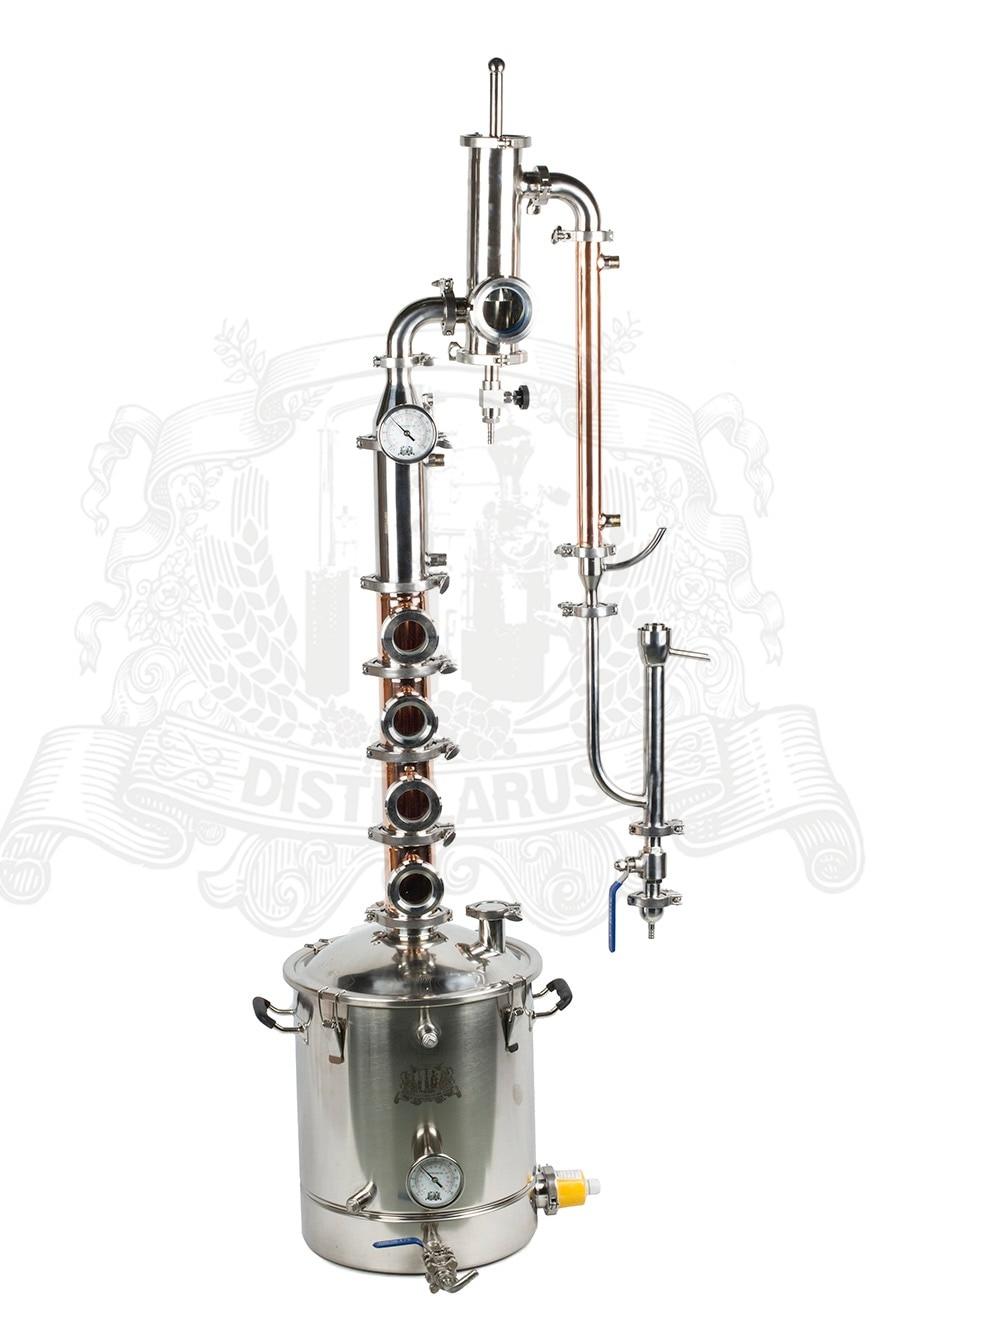 55l - 38l Copper kit for distillation with Gin Basket цена